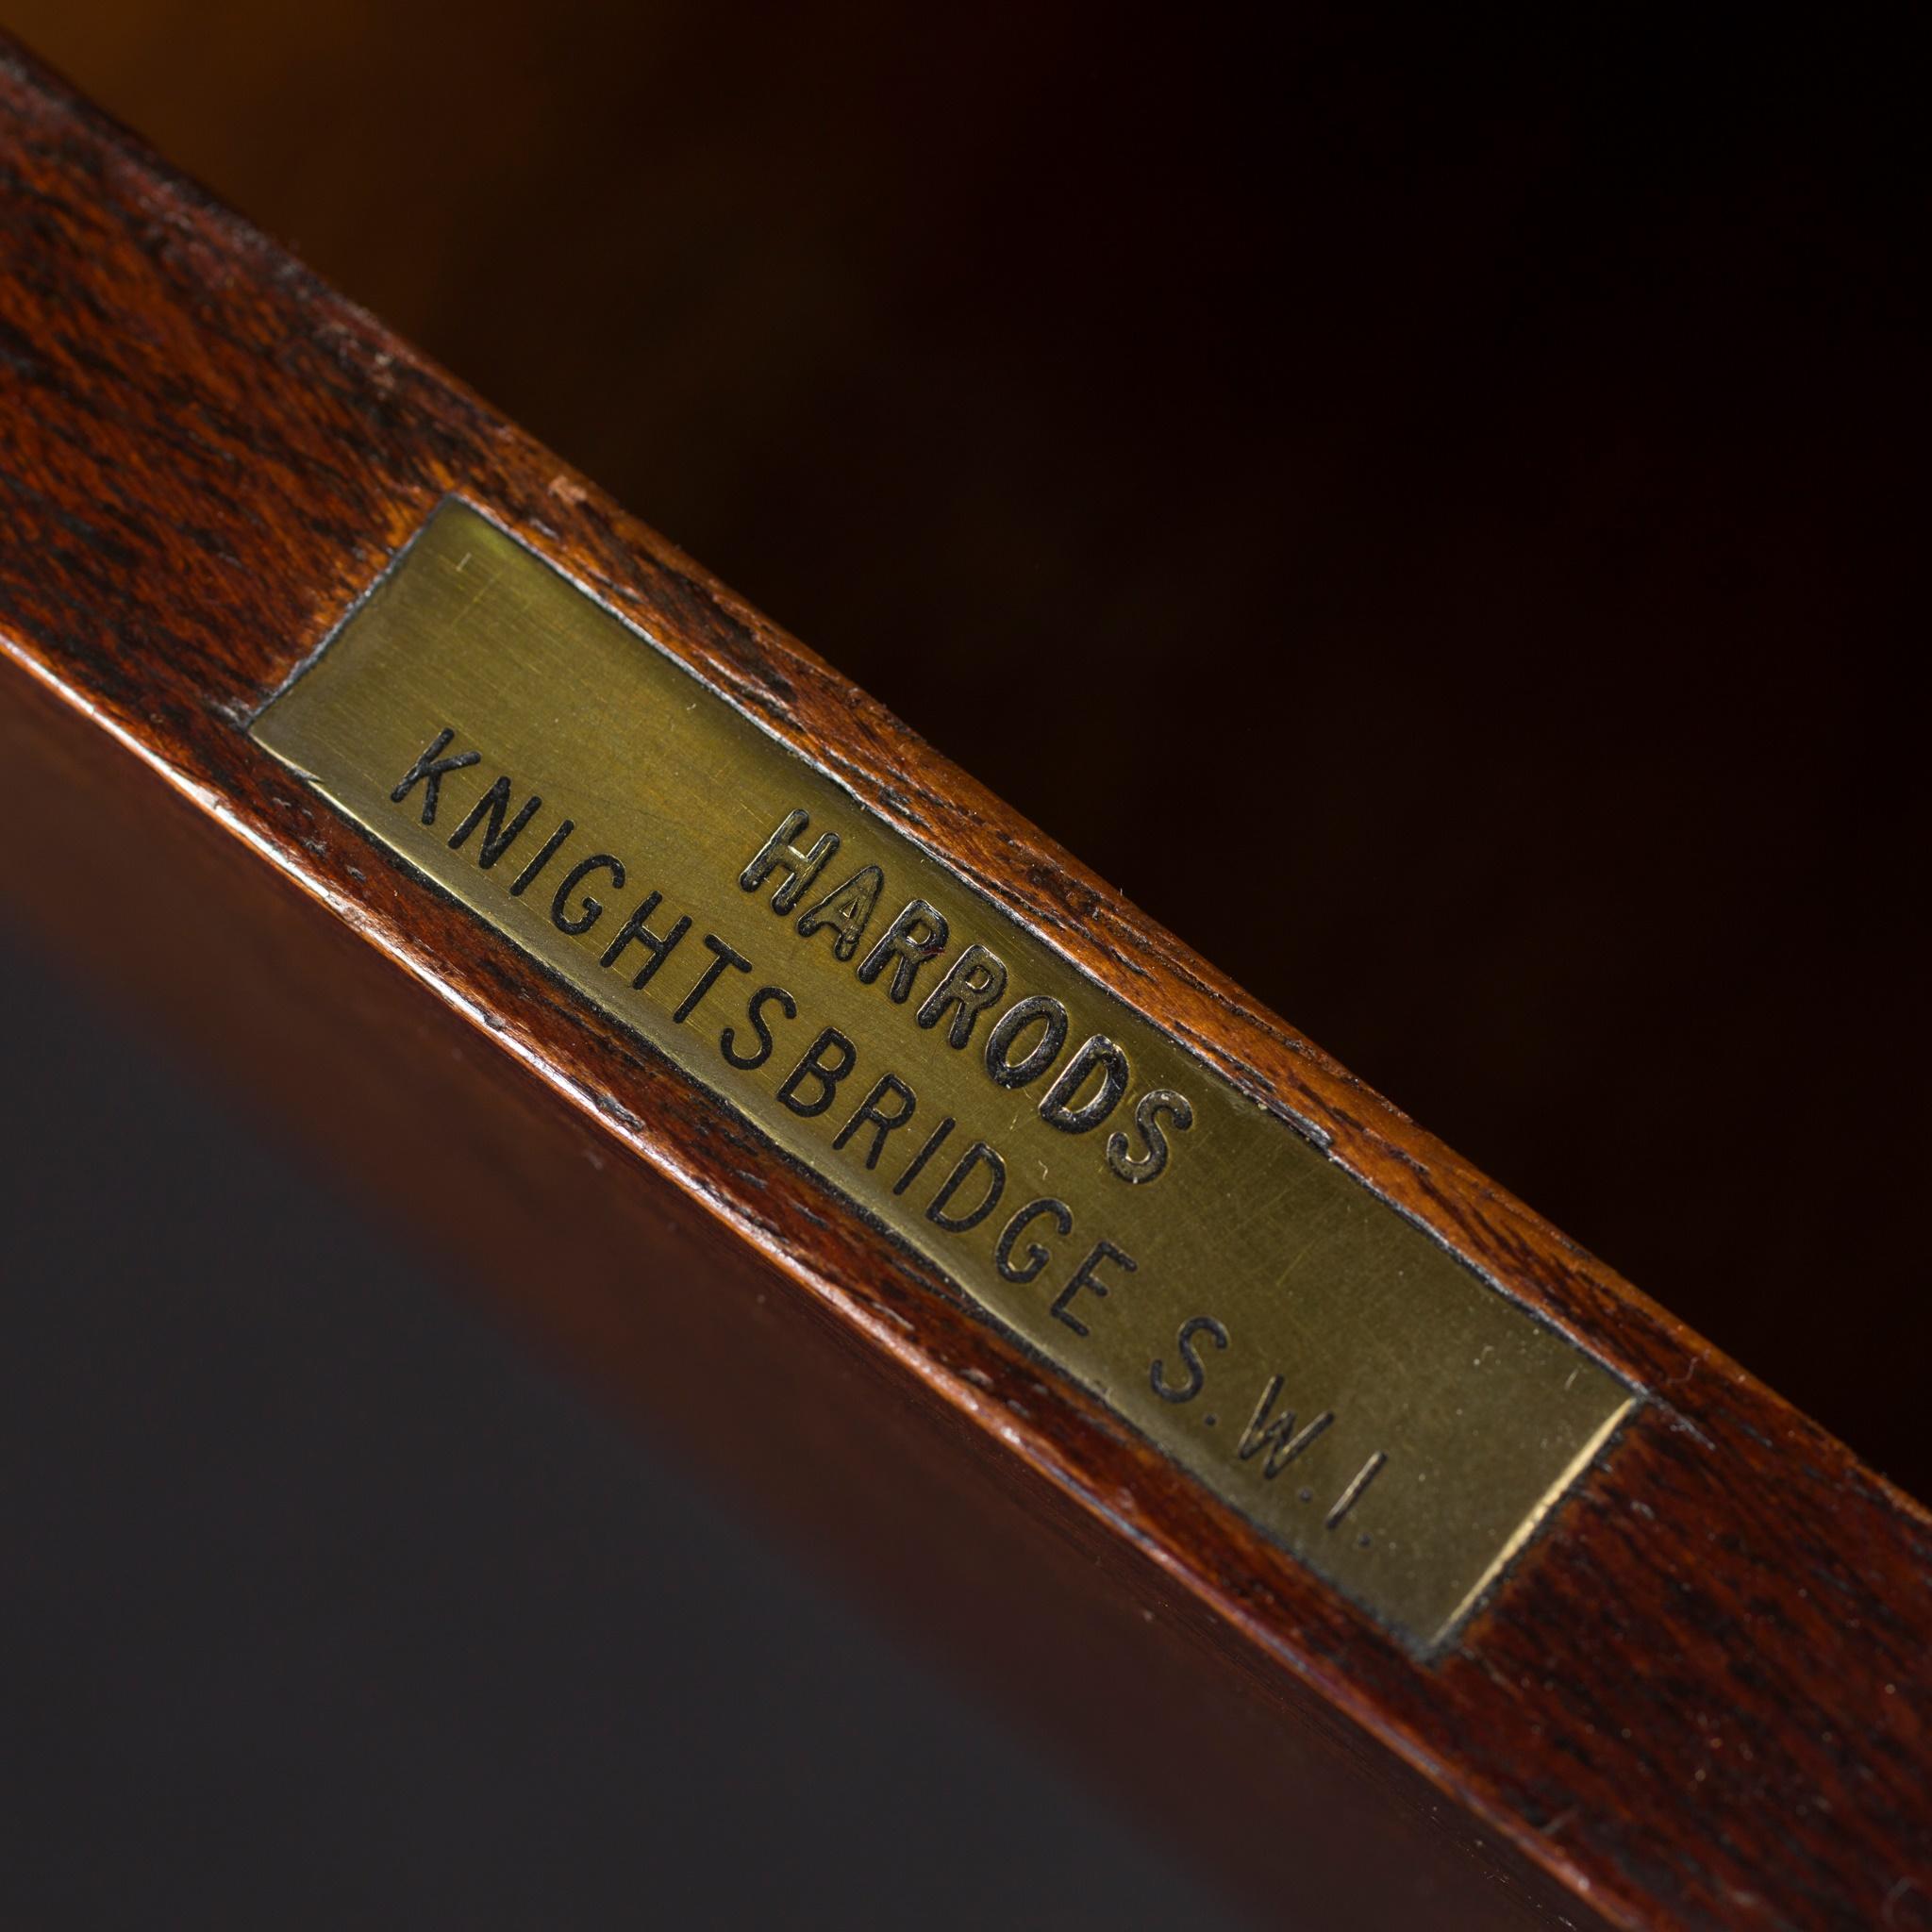 PAIR OF GEORGIAN STYLE MAHOGANY, EBONISED, AND SATINWOOD PEMBROKE TABLES 20TH CENTURY - Image 2 of 2